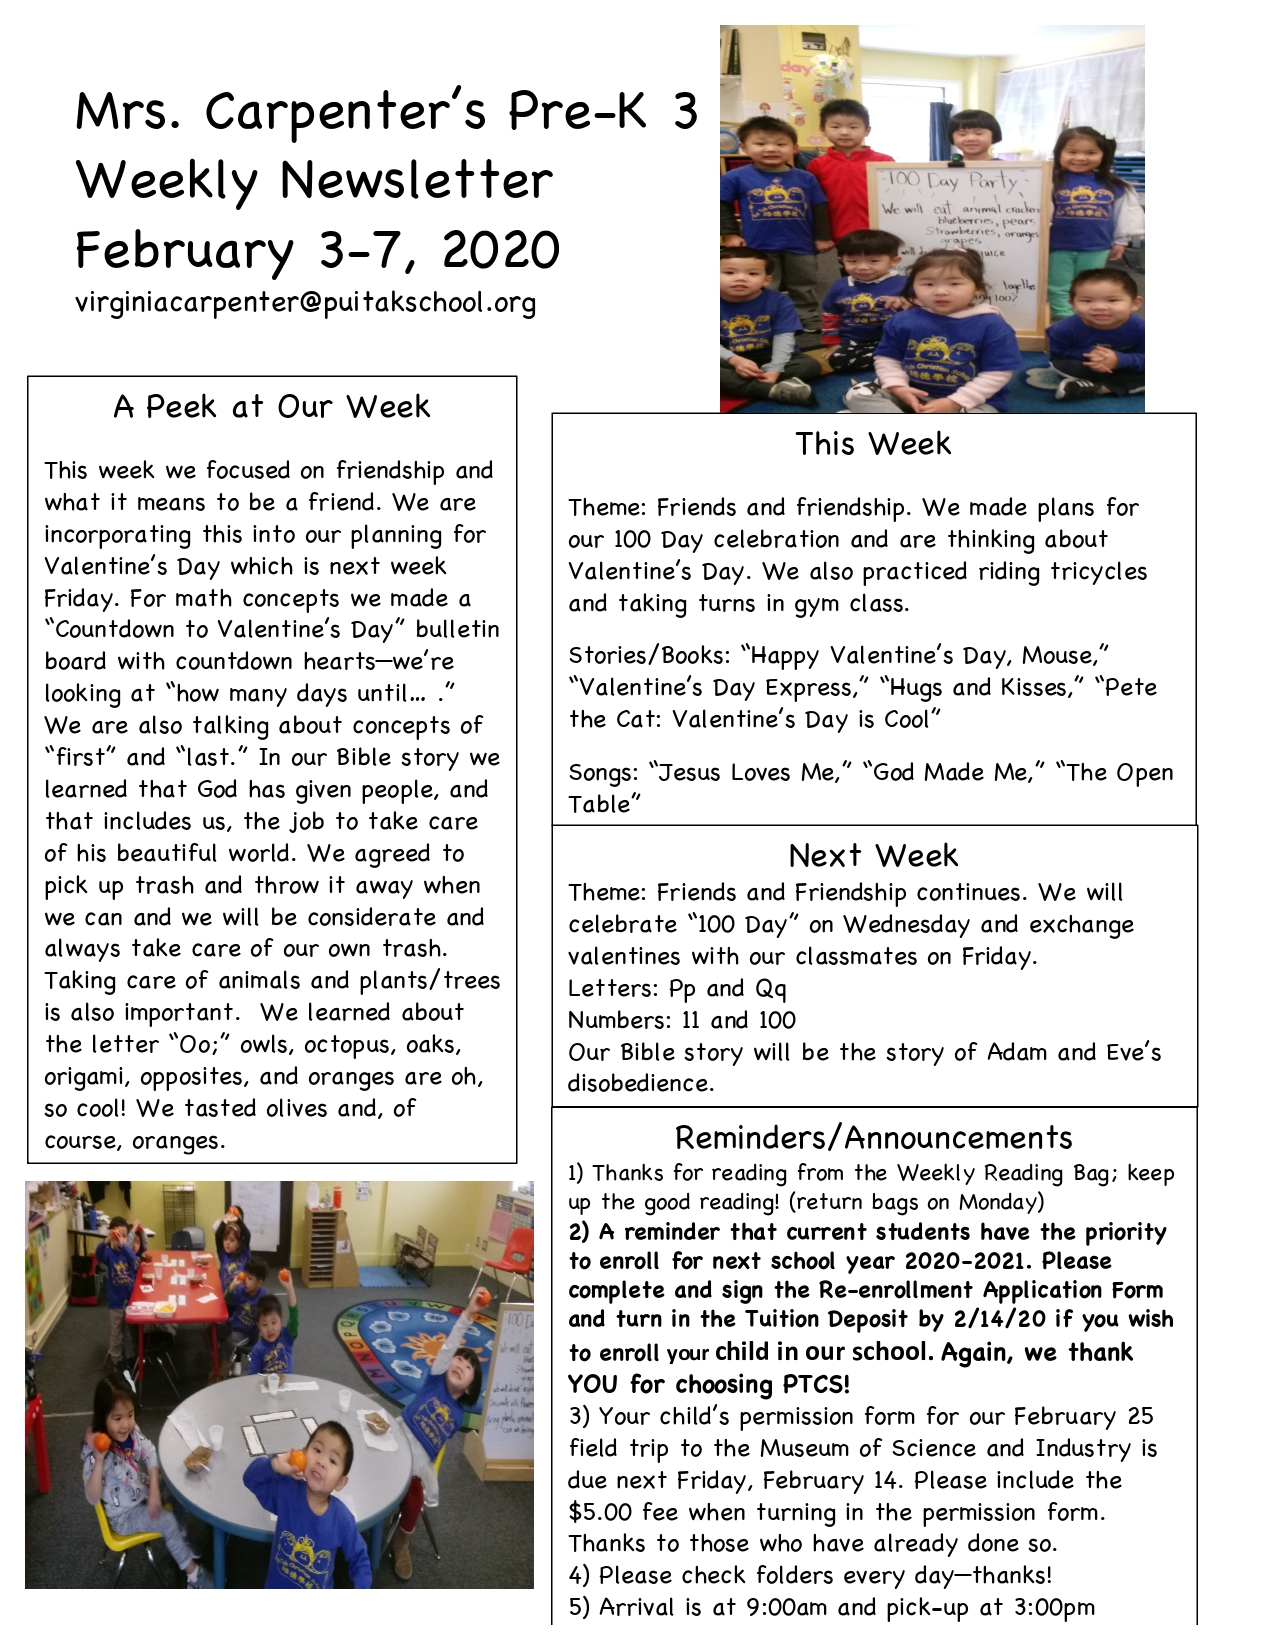 GinnyNewsletter2020February1stWeek_page-